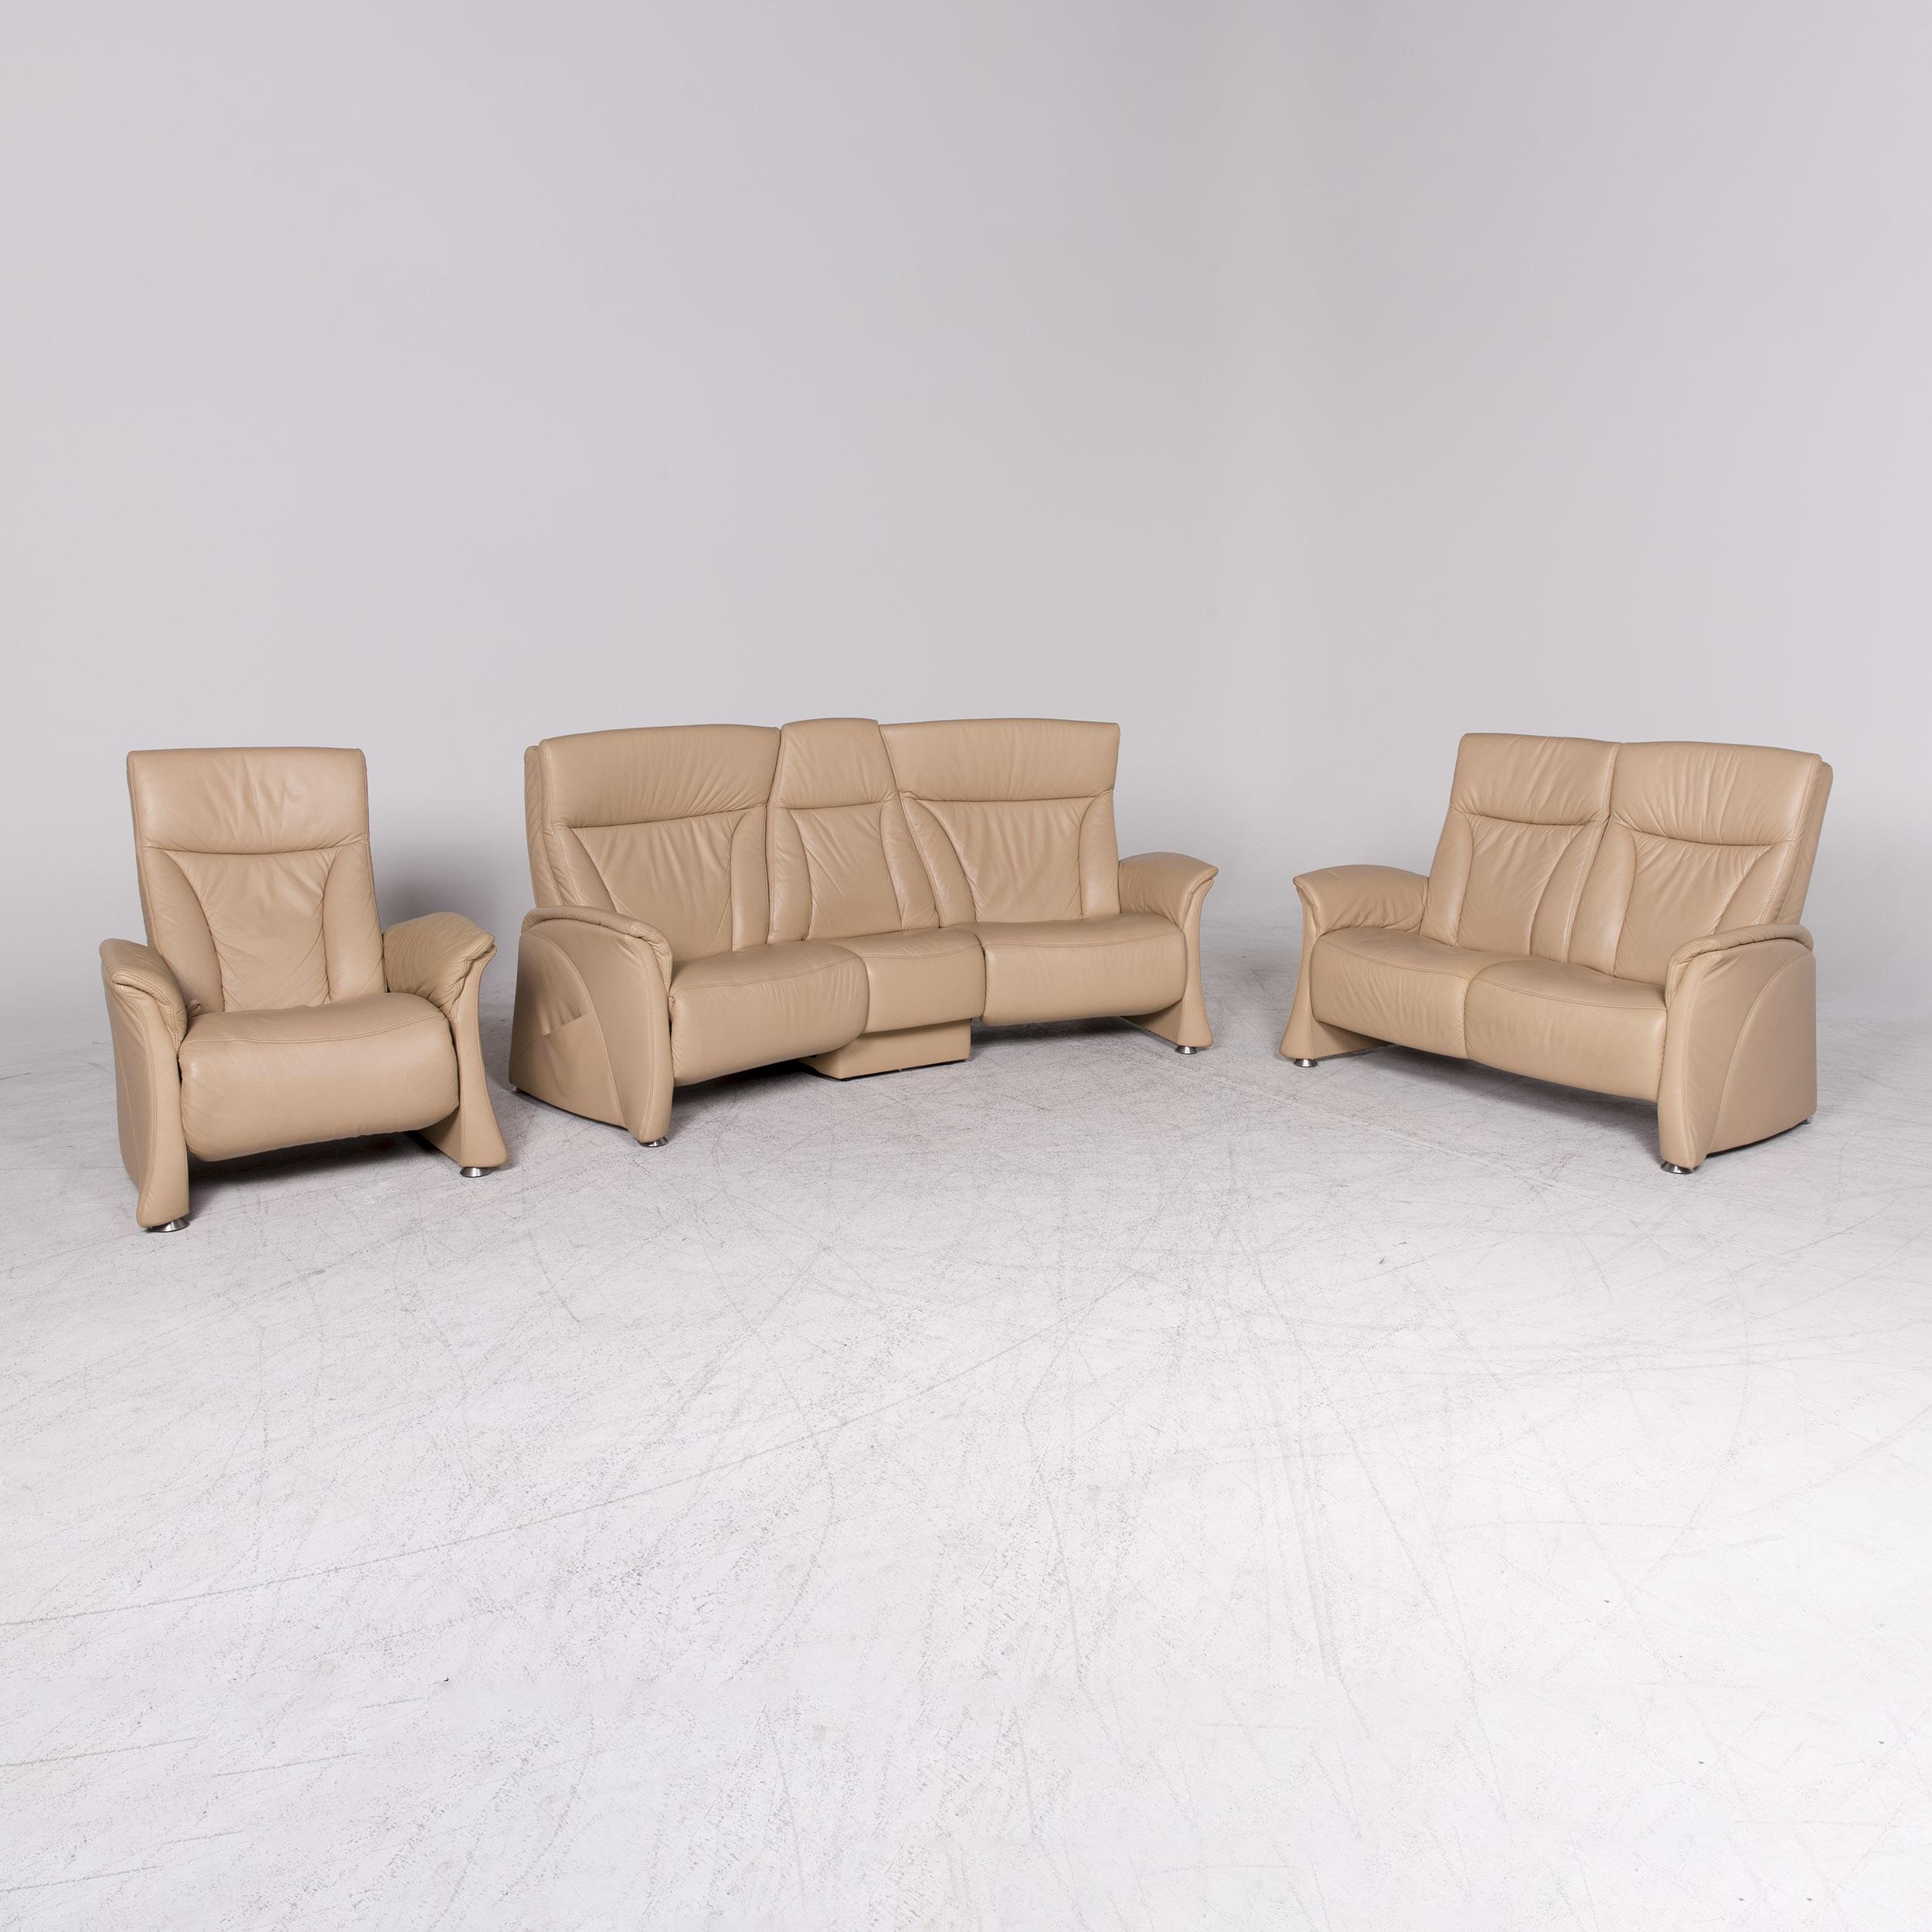 Himolla Designer Leather Sofa Armchair Set Beige Genuine Leather